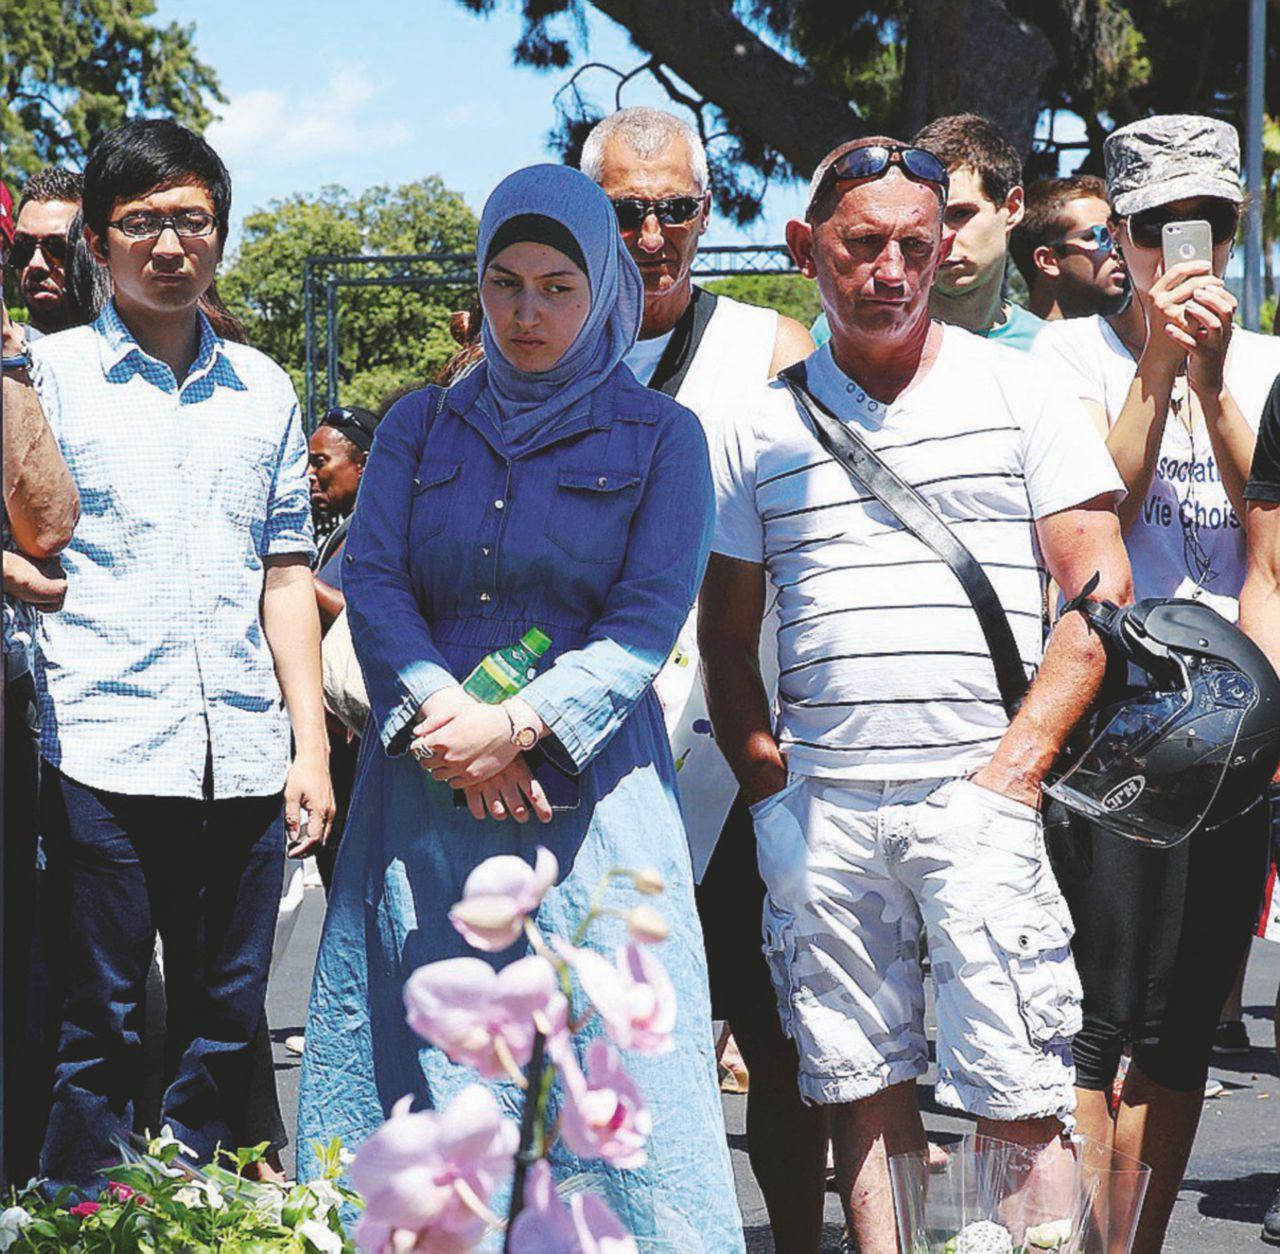 Fatima, musulmana falciata in nome di Allah